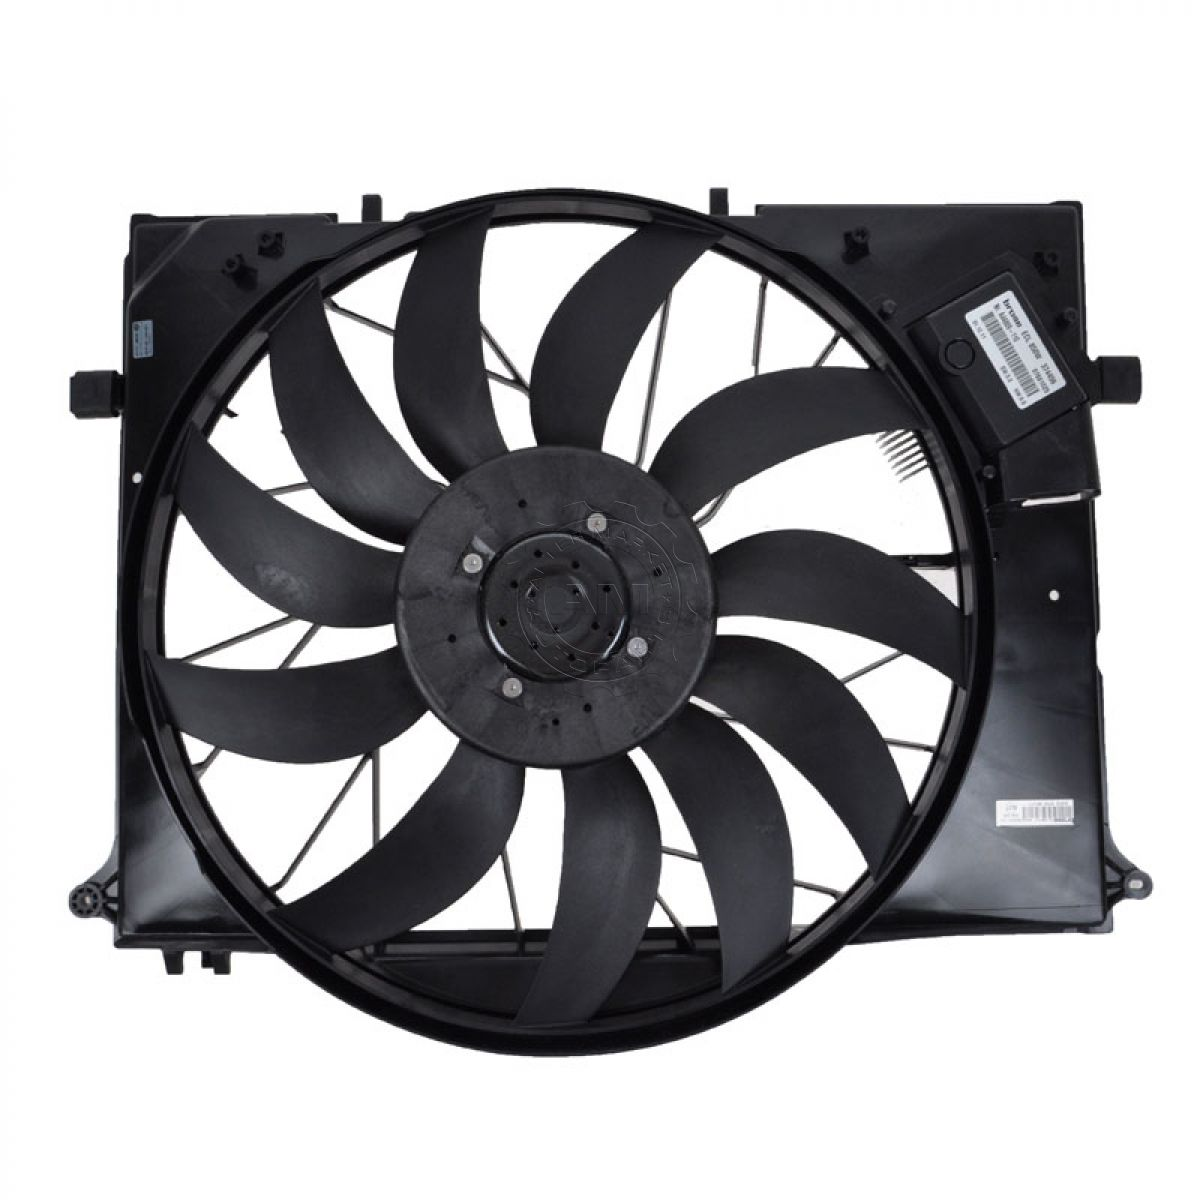 Behr 351040091 radiator cooling fan for mercedes benz cl s for Mercedes benz fans